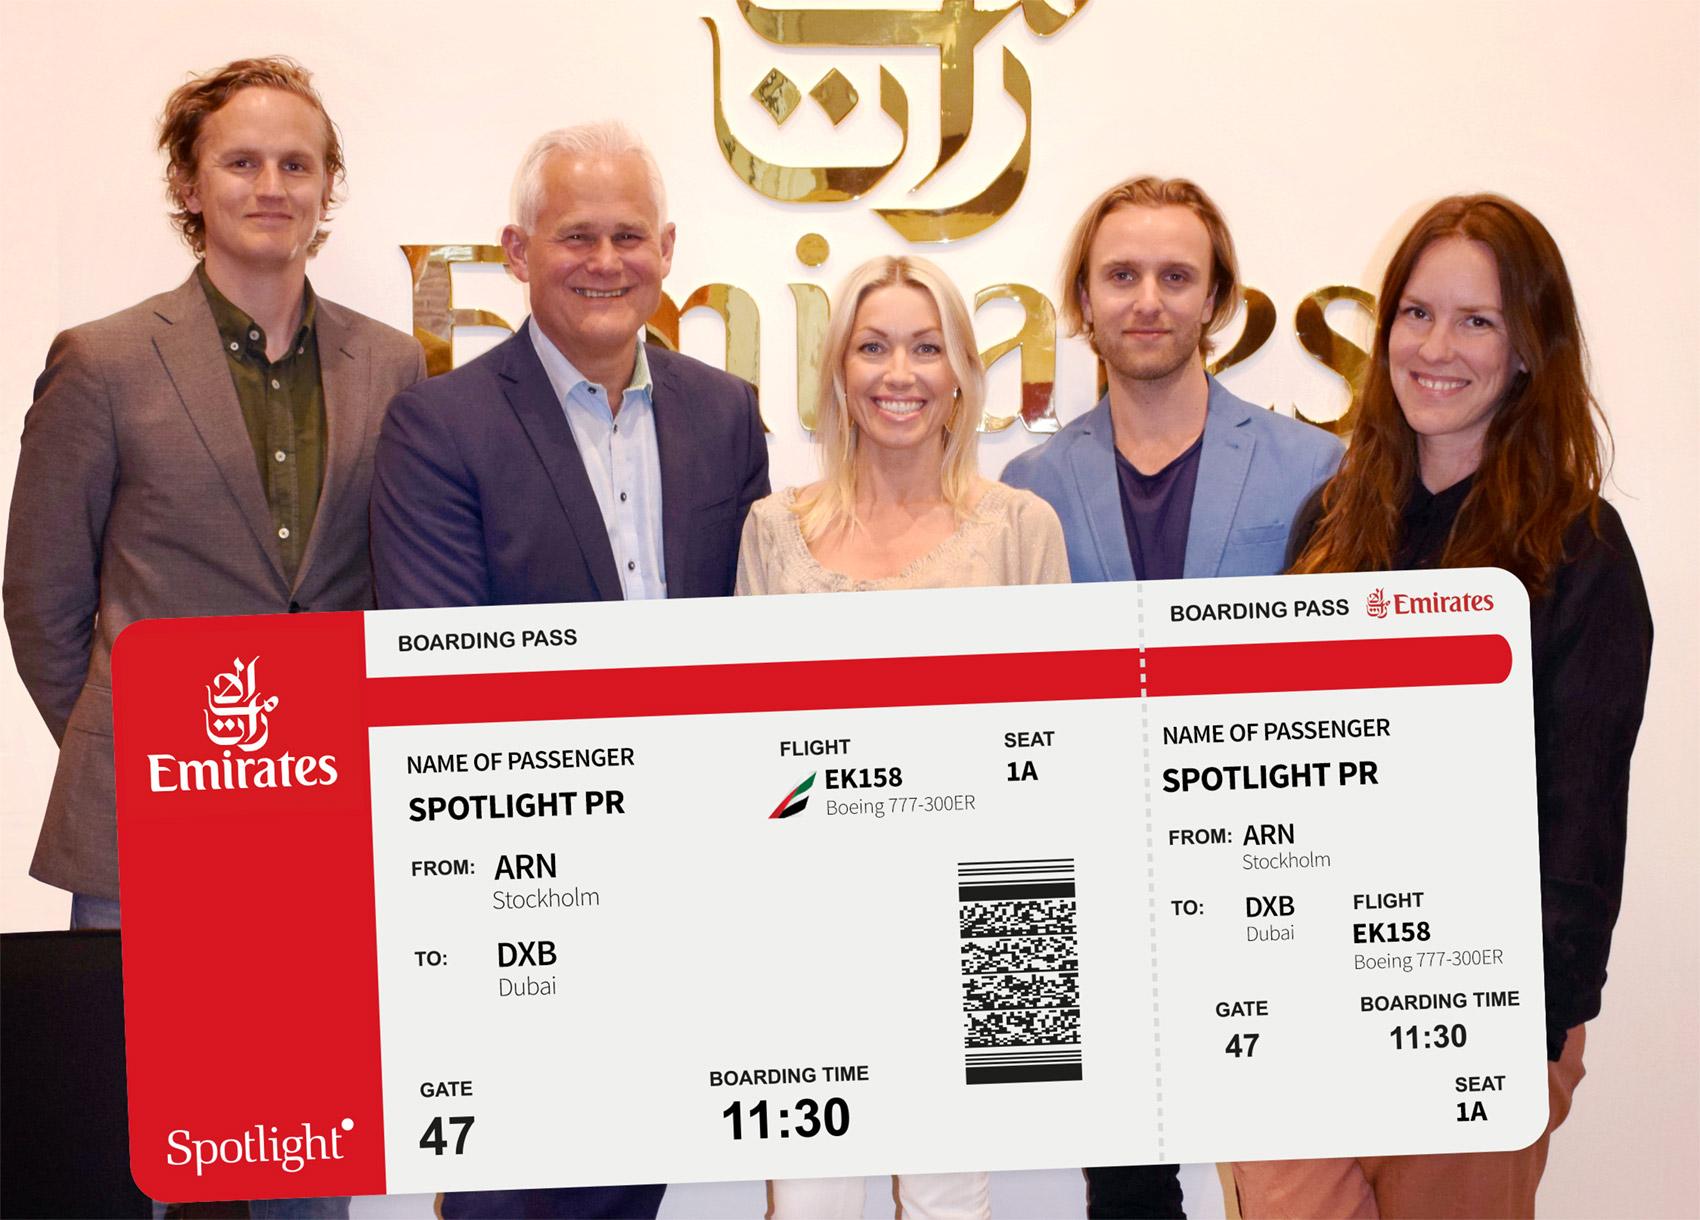 spotlightpr_emirates